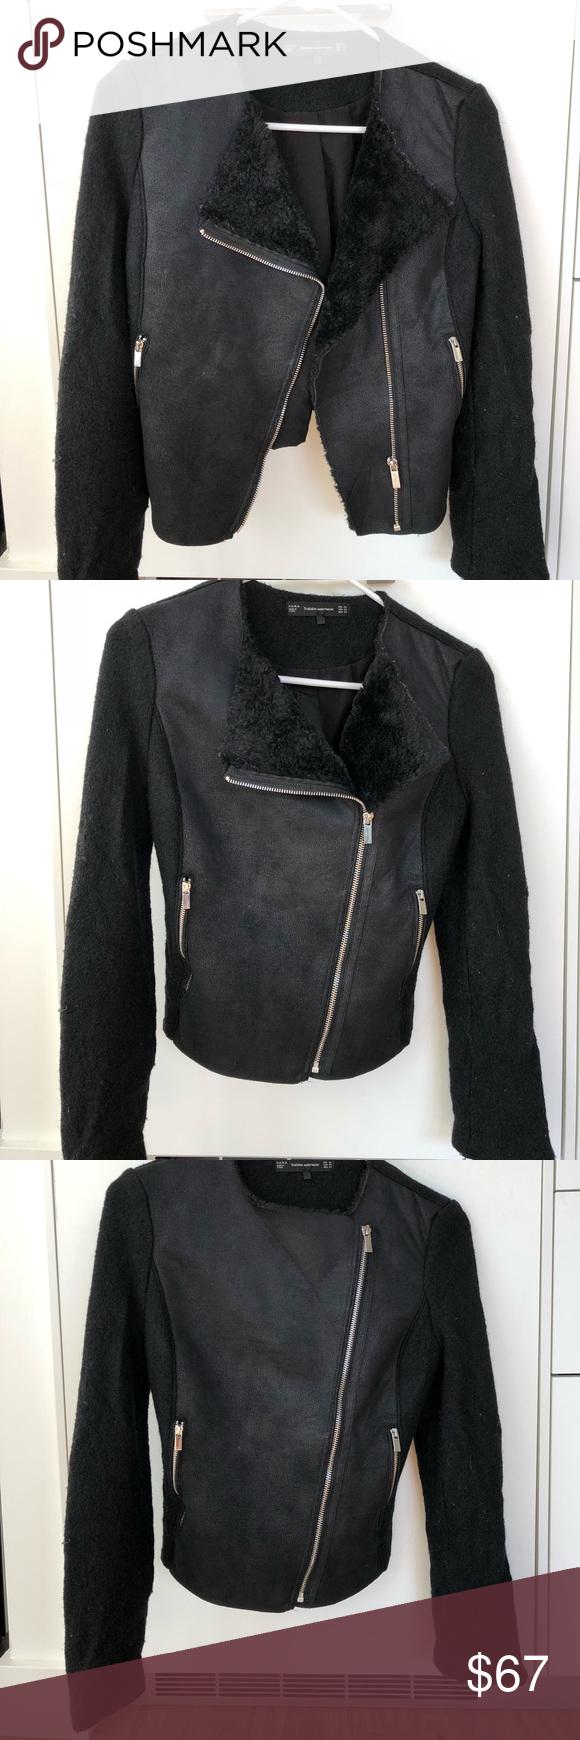 Zara Trafaluc Outerwear Black Suede Jacket Zara Trafaluc Outerwear Suede Wool With Silver Zippers Black Size Xs Black Suede Jacket Suede Jacket Black Suede [ 1740 x 580 Pixel ]